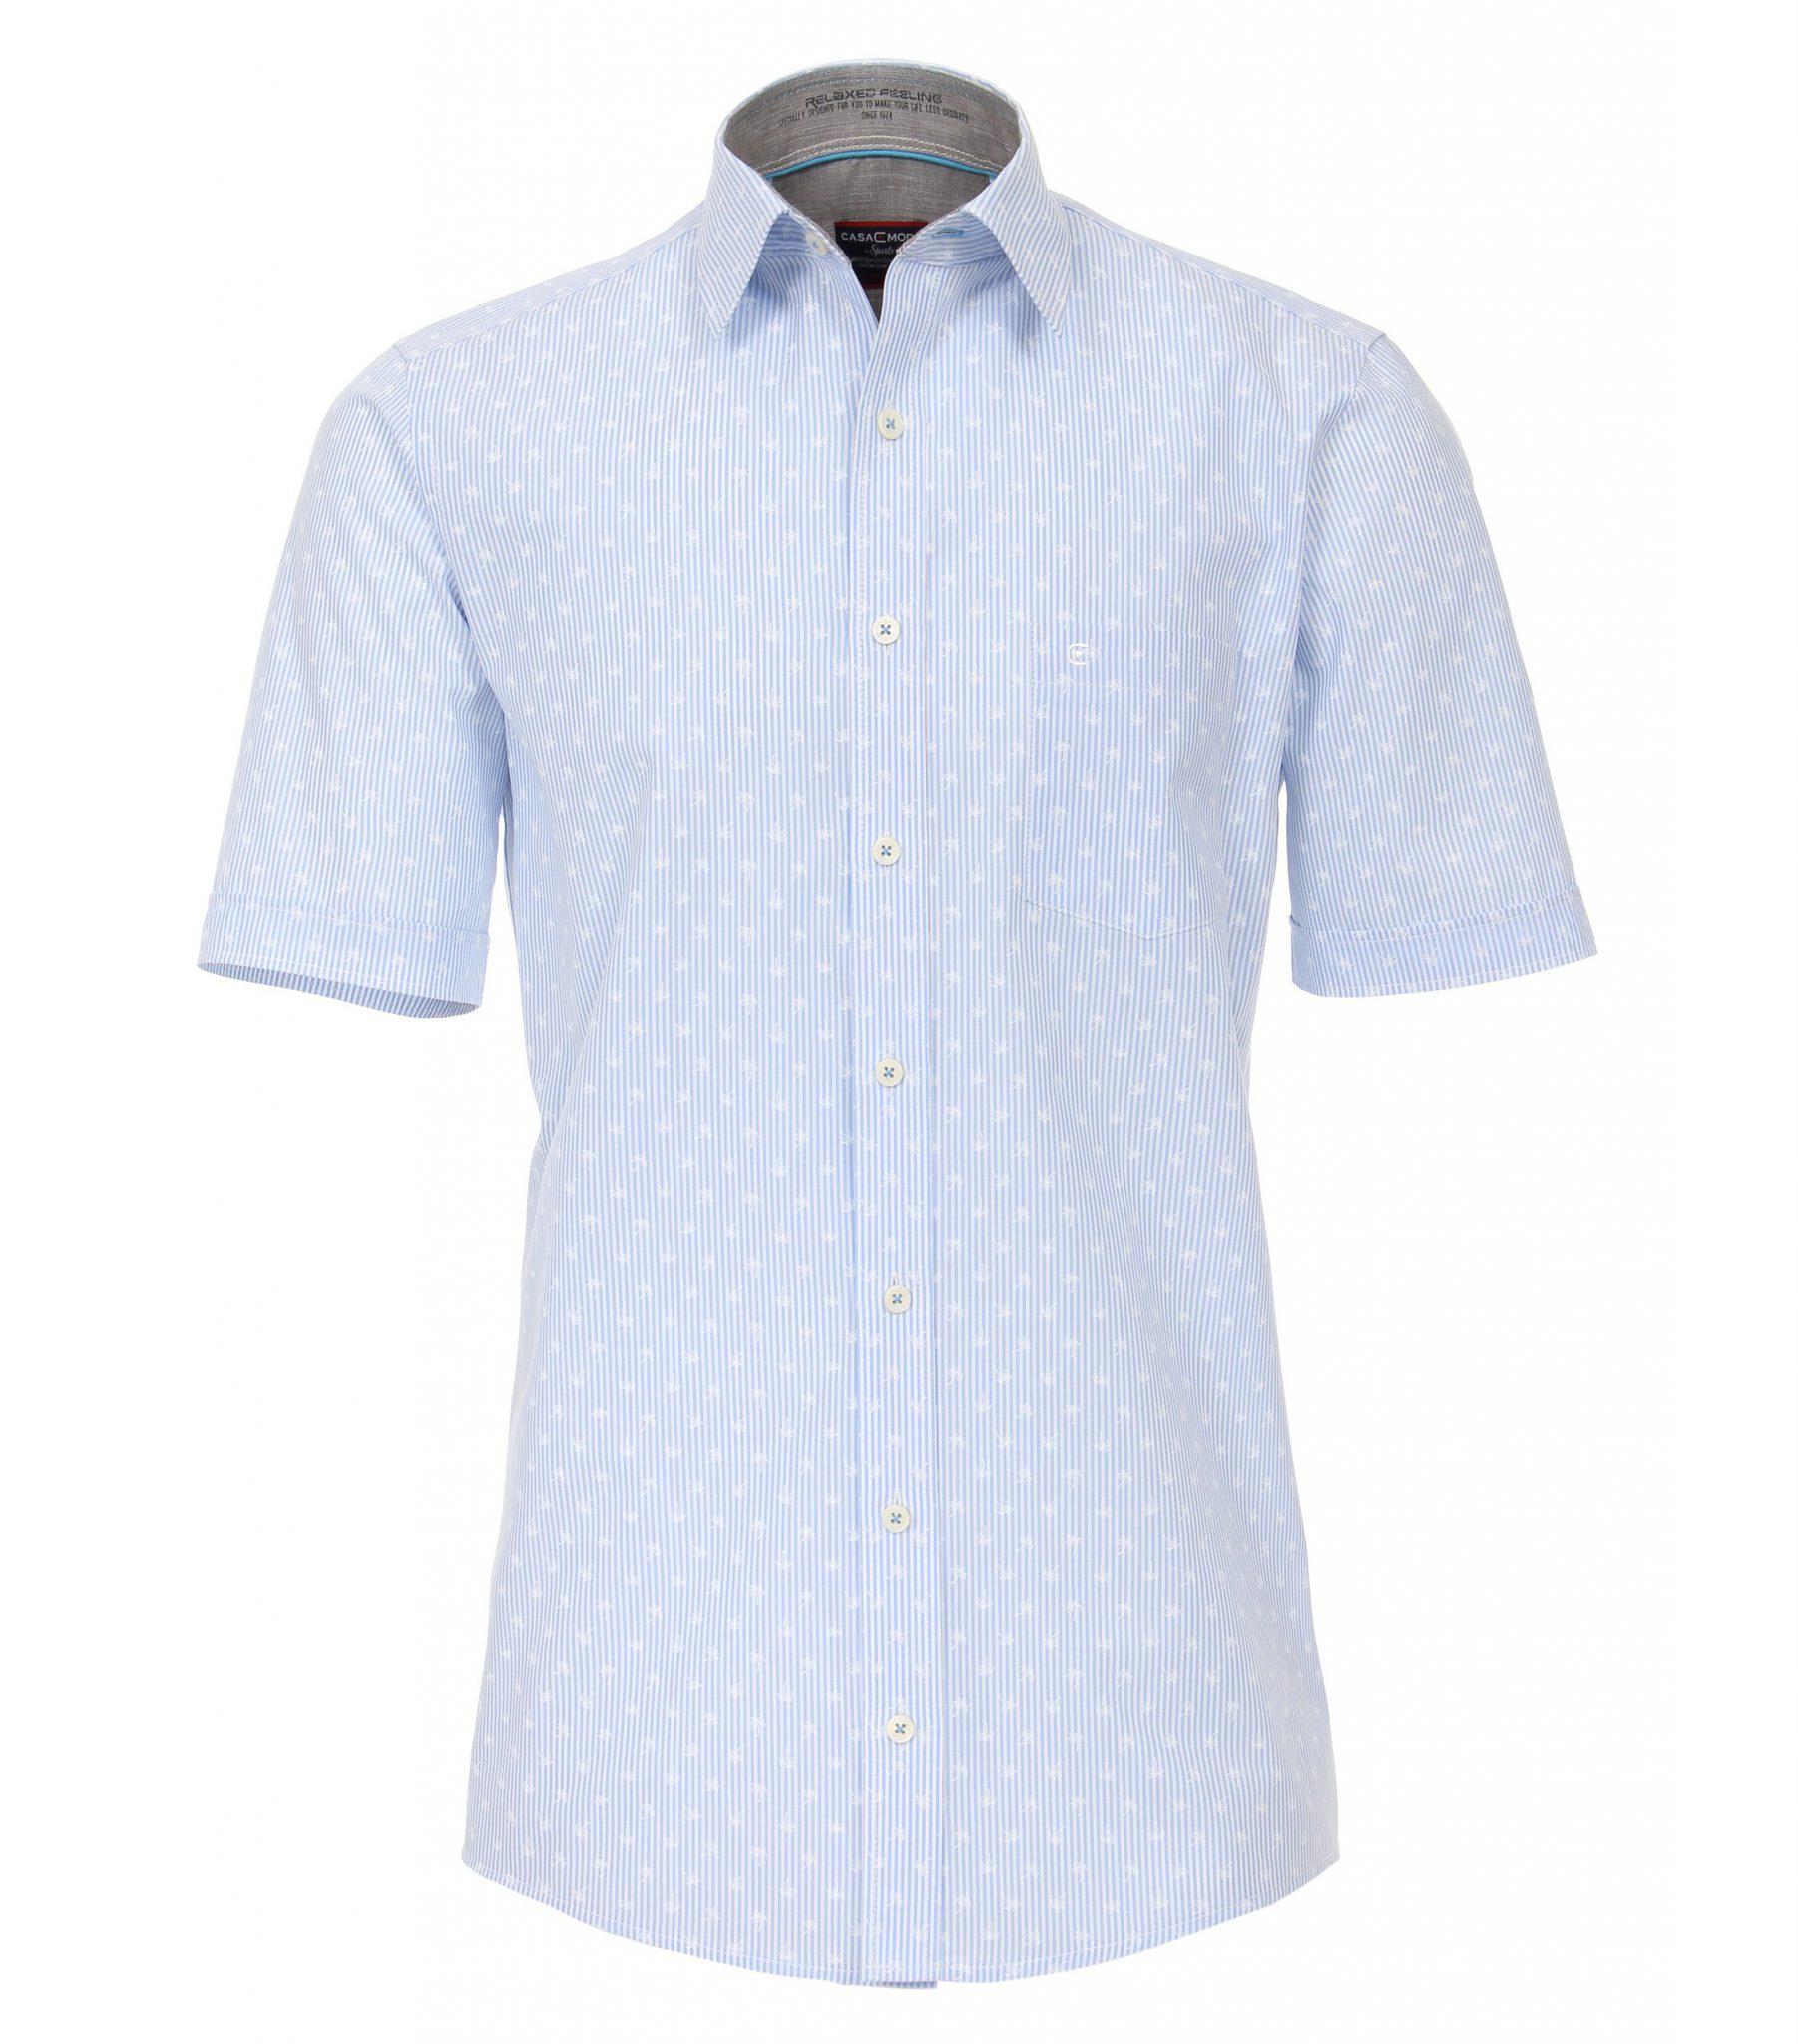 Casa Moda grote maat overhemd blauw en witte lengte streep